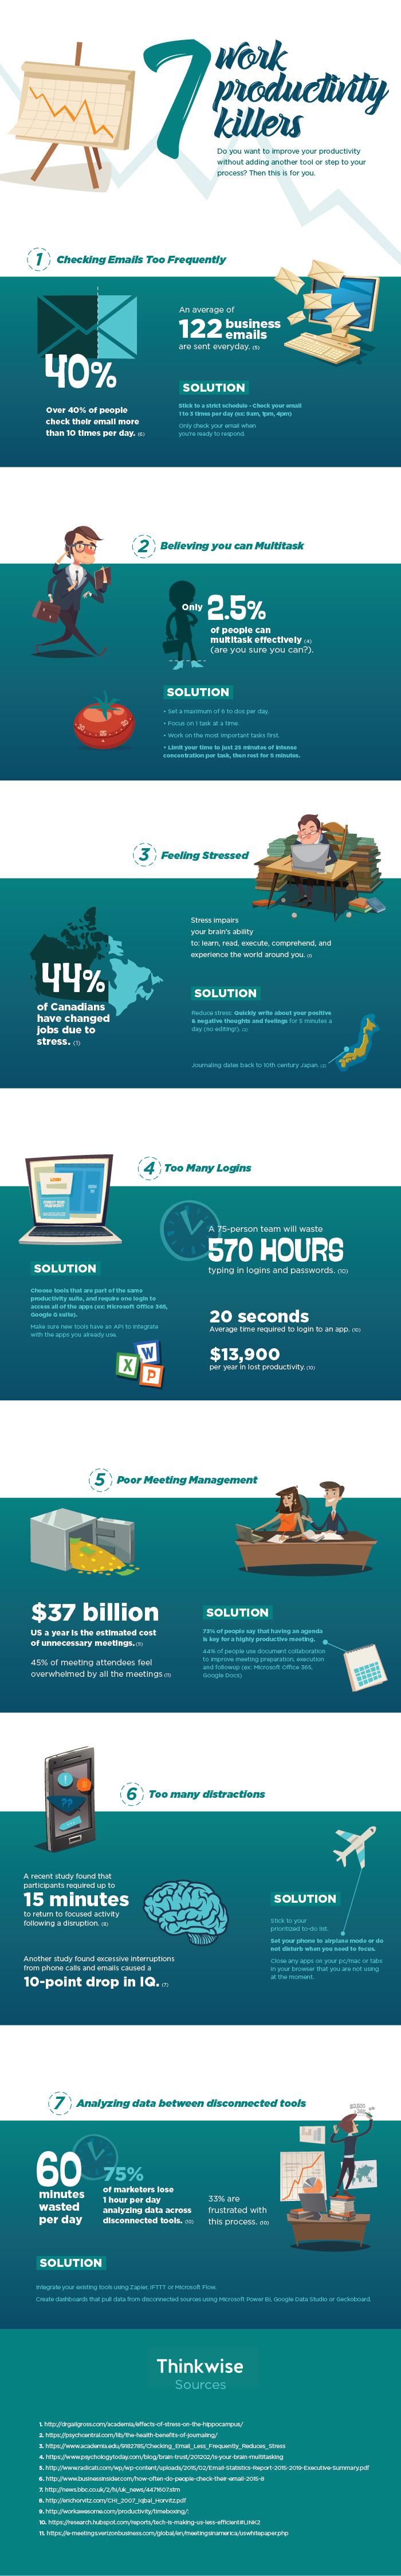 Work-Productivity-Infographic-Thinkwise.jpg